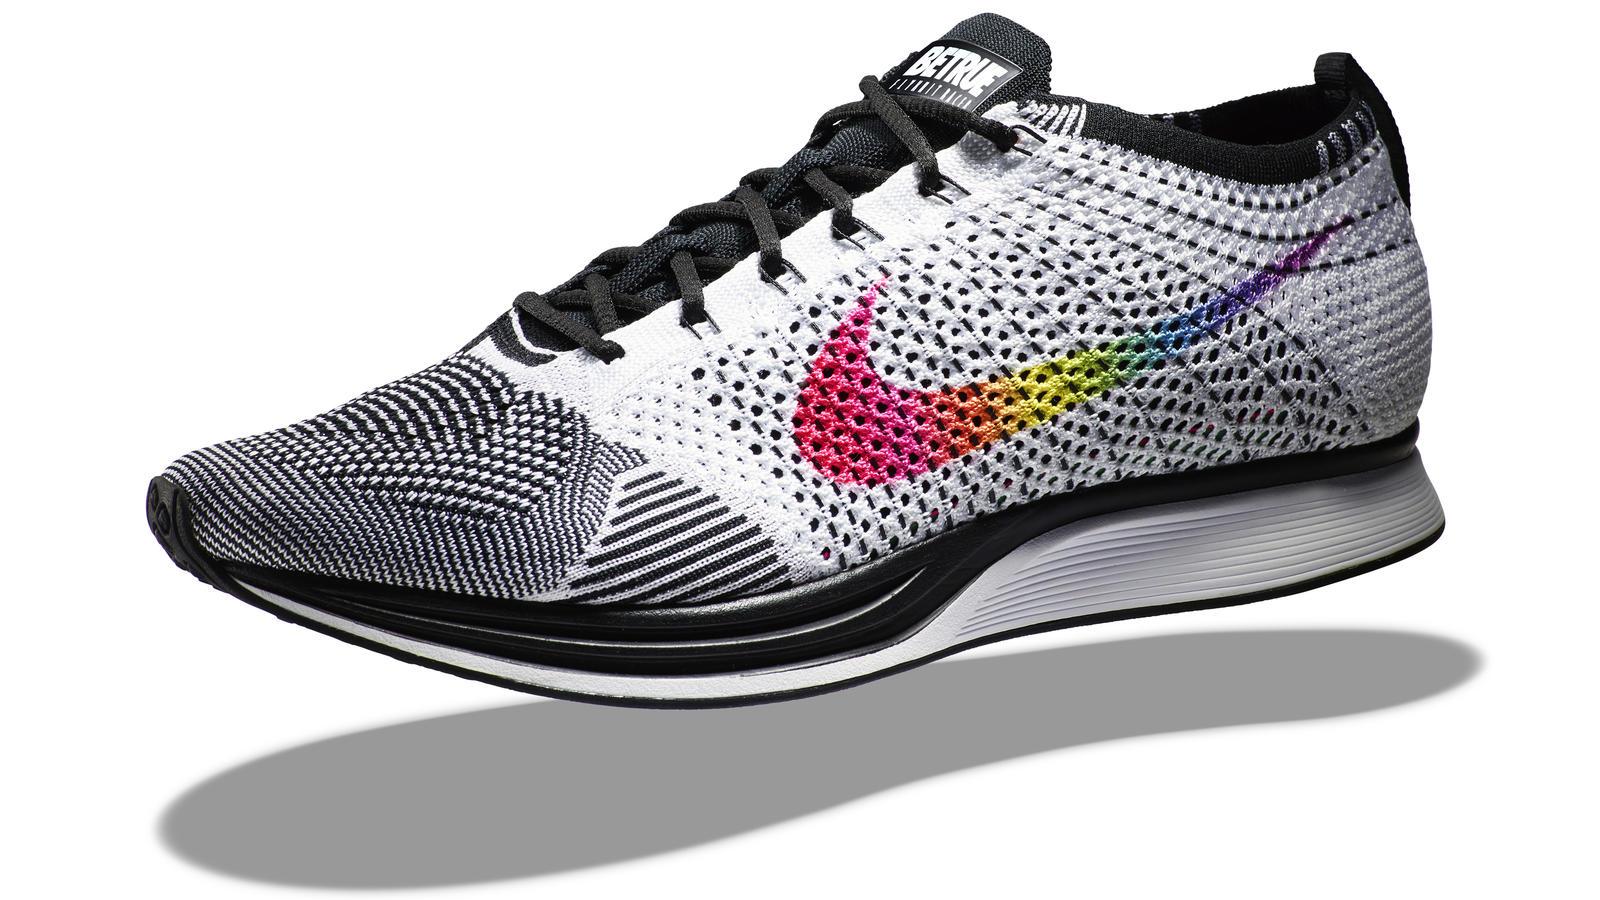 Rainbow Womens Noke Tennis Shoes New